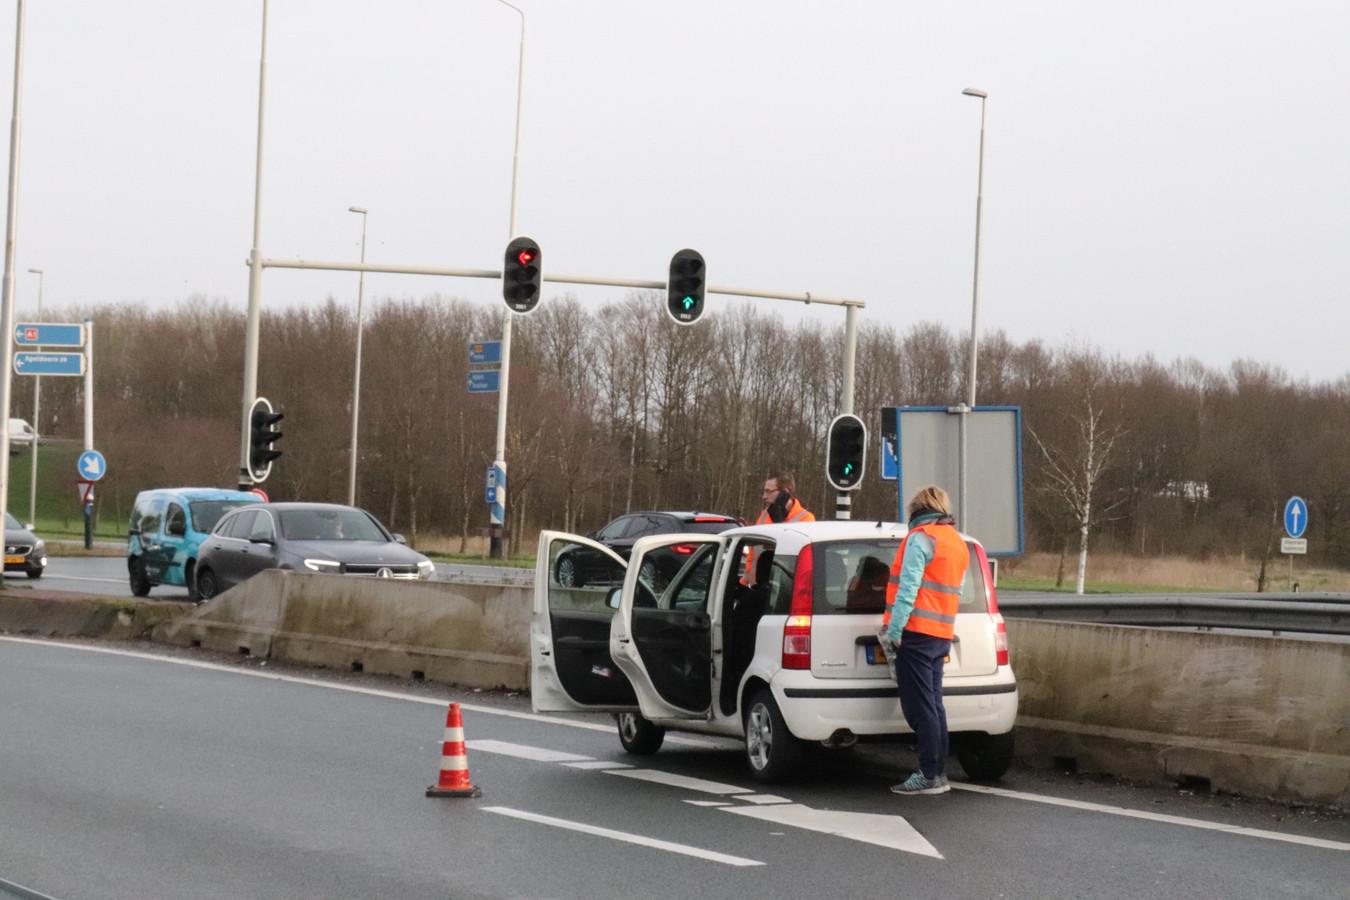 De gecrashte auto bij de oprit naar de A30.